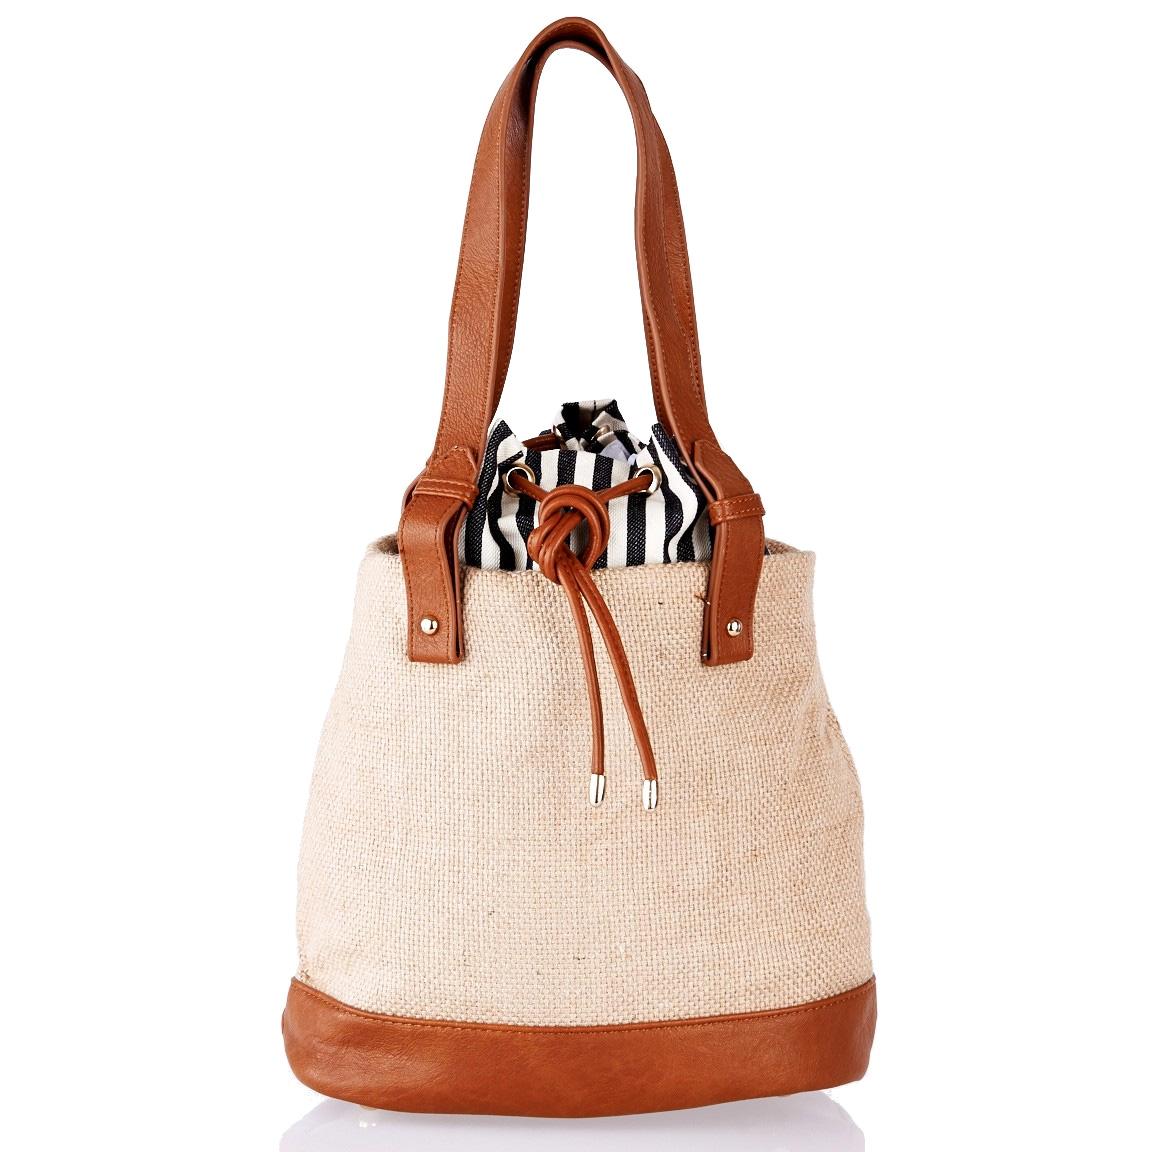 Shopping bag LN3100002Beige  Large Straw Detail Shopper Bag